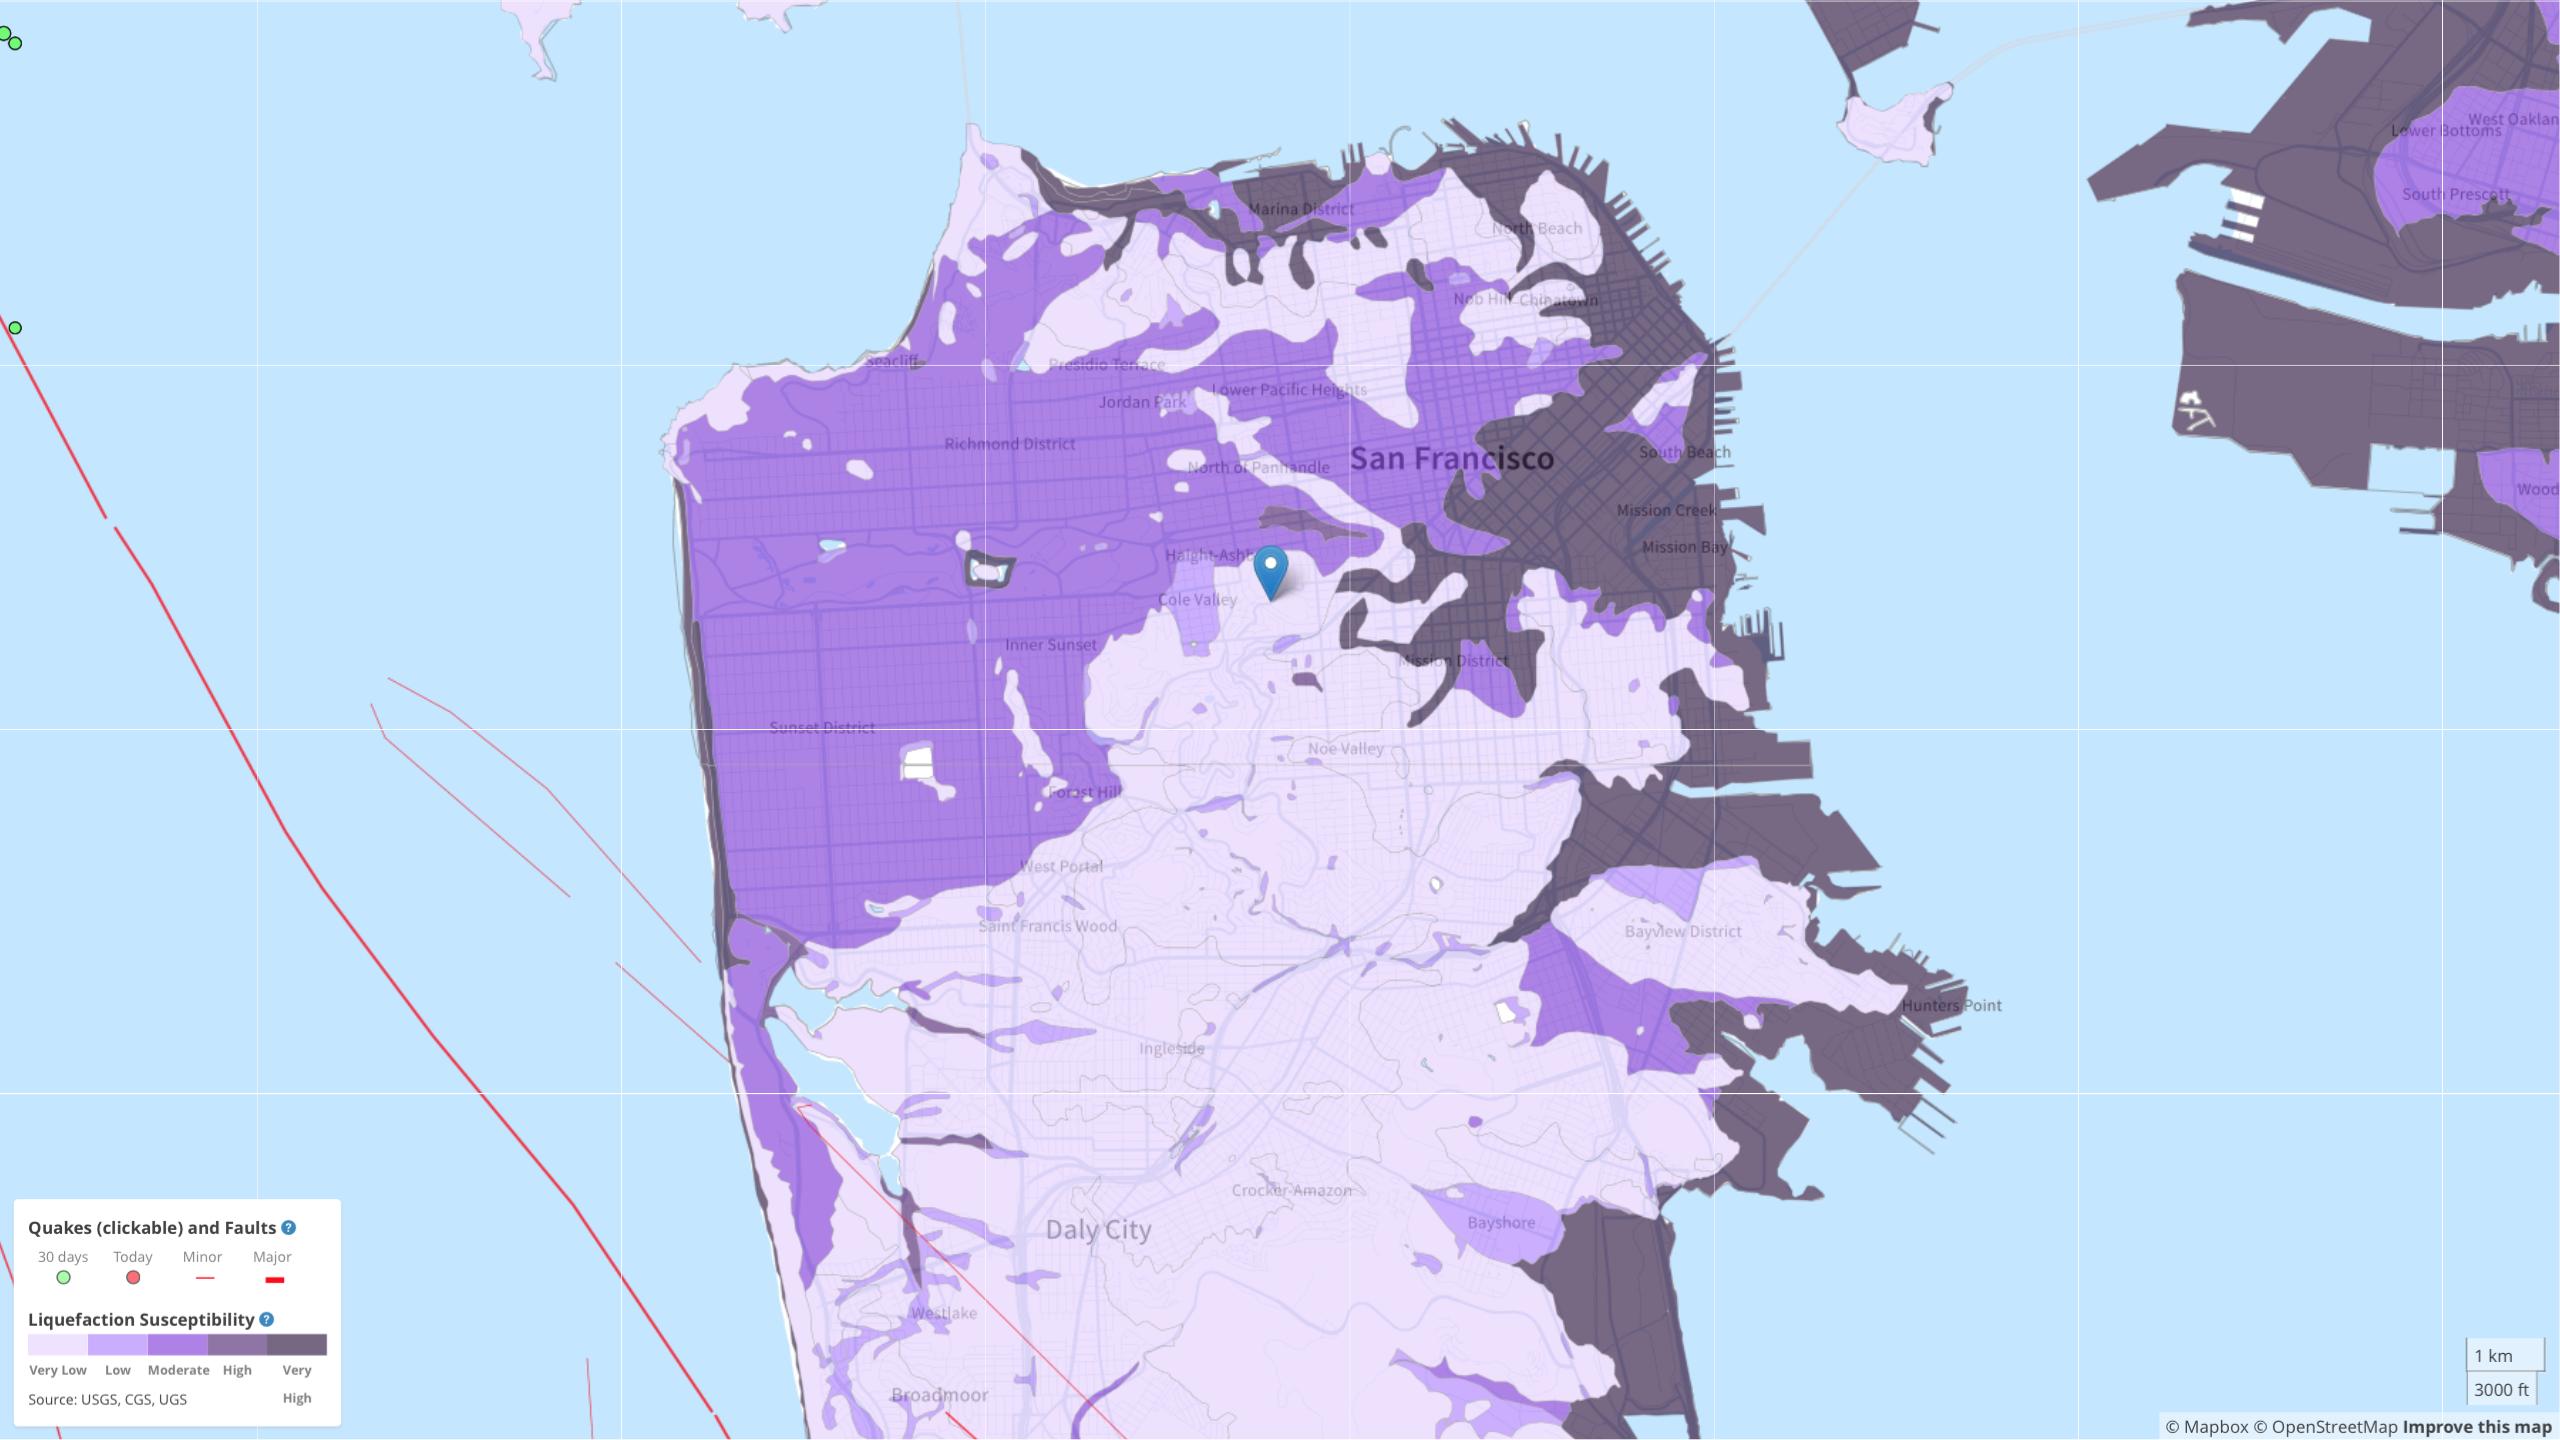 Bay Area Liquefaction, Landslide, and Seismic Zones – Mapped